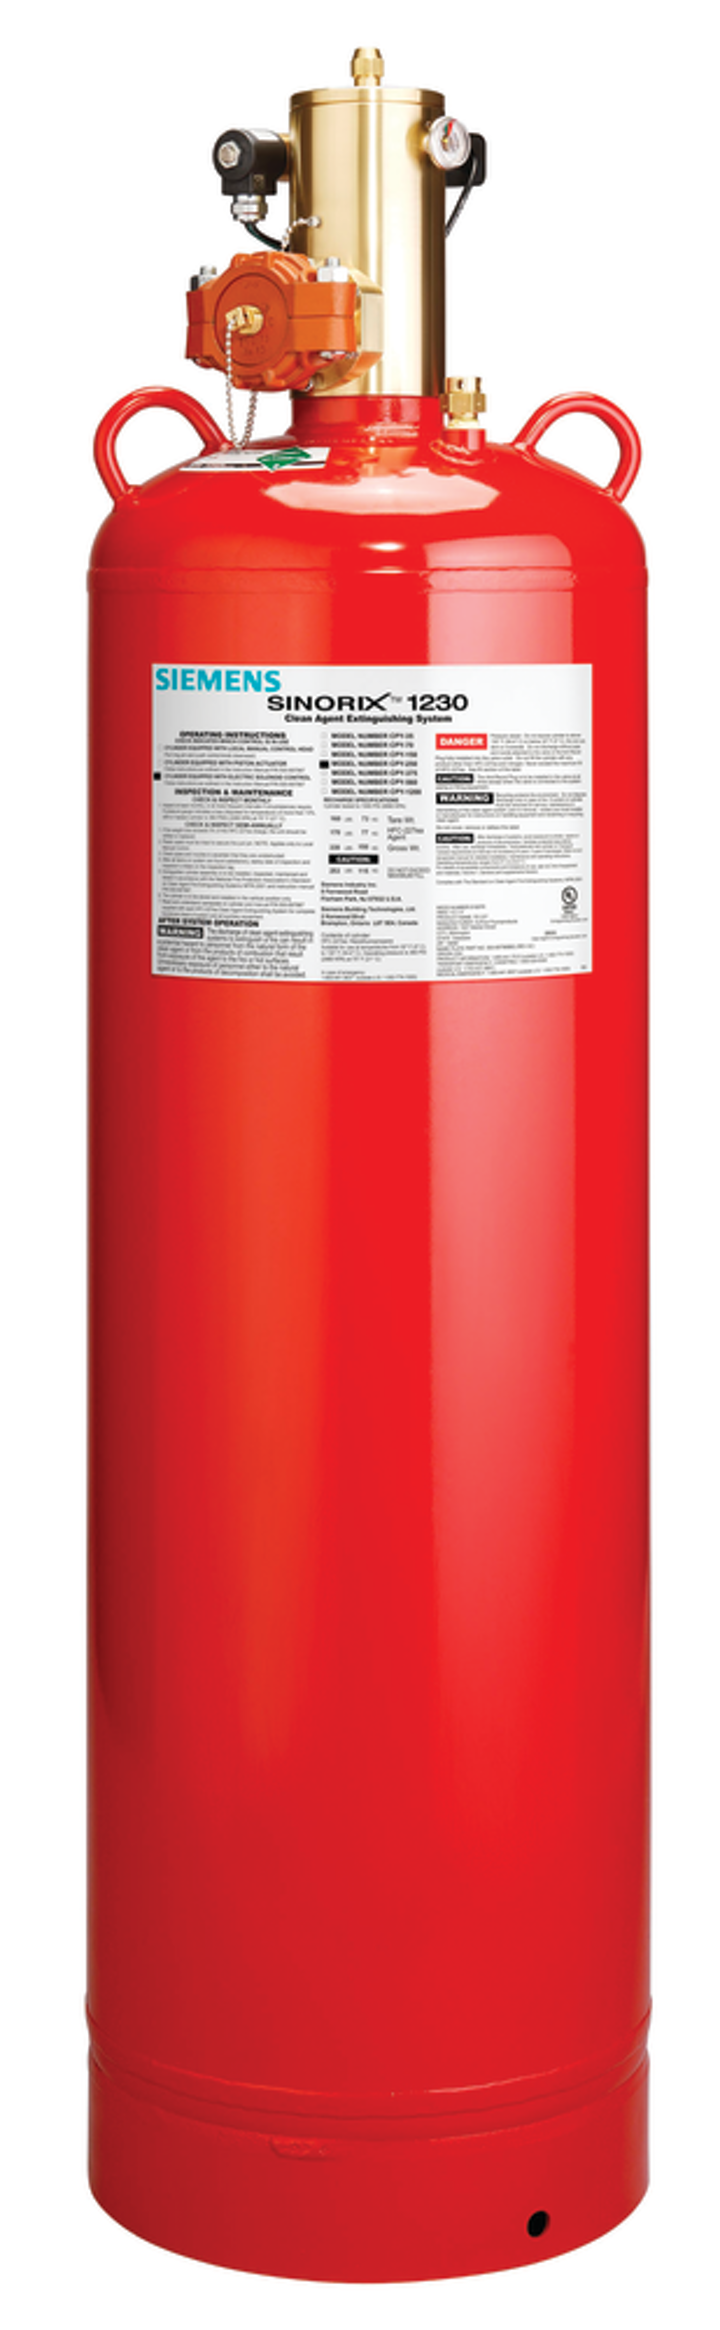 SINORIX 1230 - NOVEC 1230 GAS BASED FIRE SUPPRESSION SYSTEM